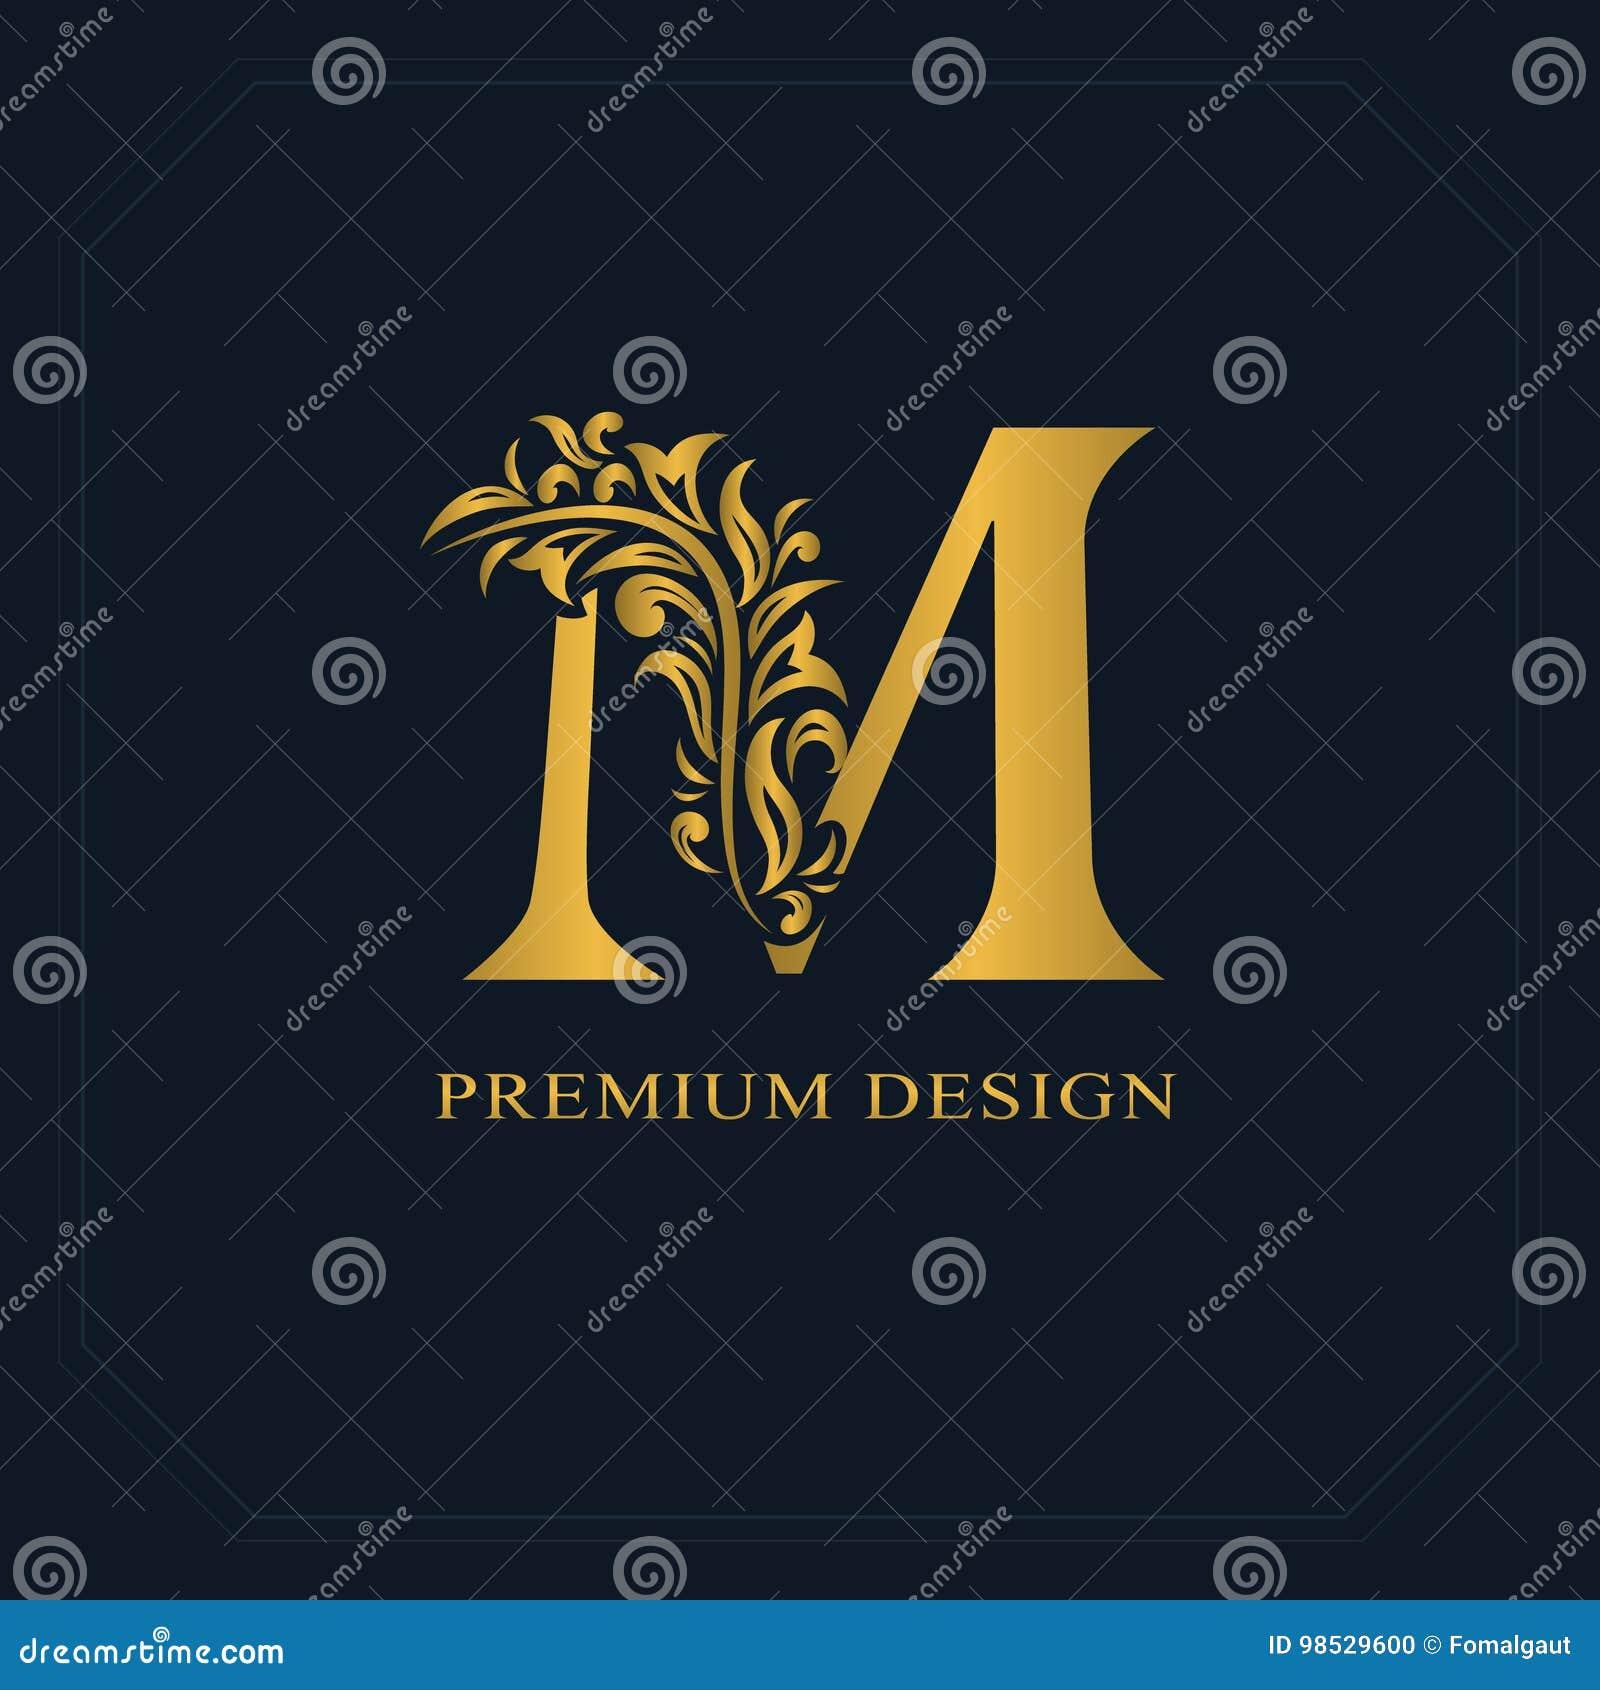 Gold Elegant Letter N Graceful Style Calligraphic